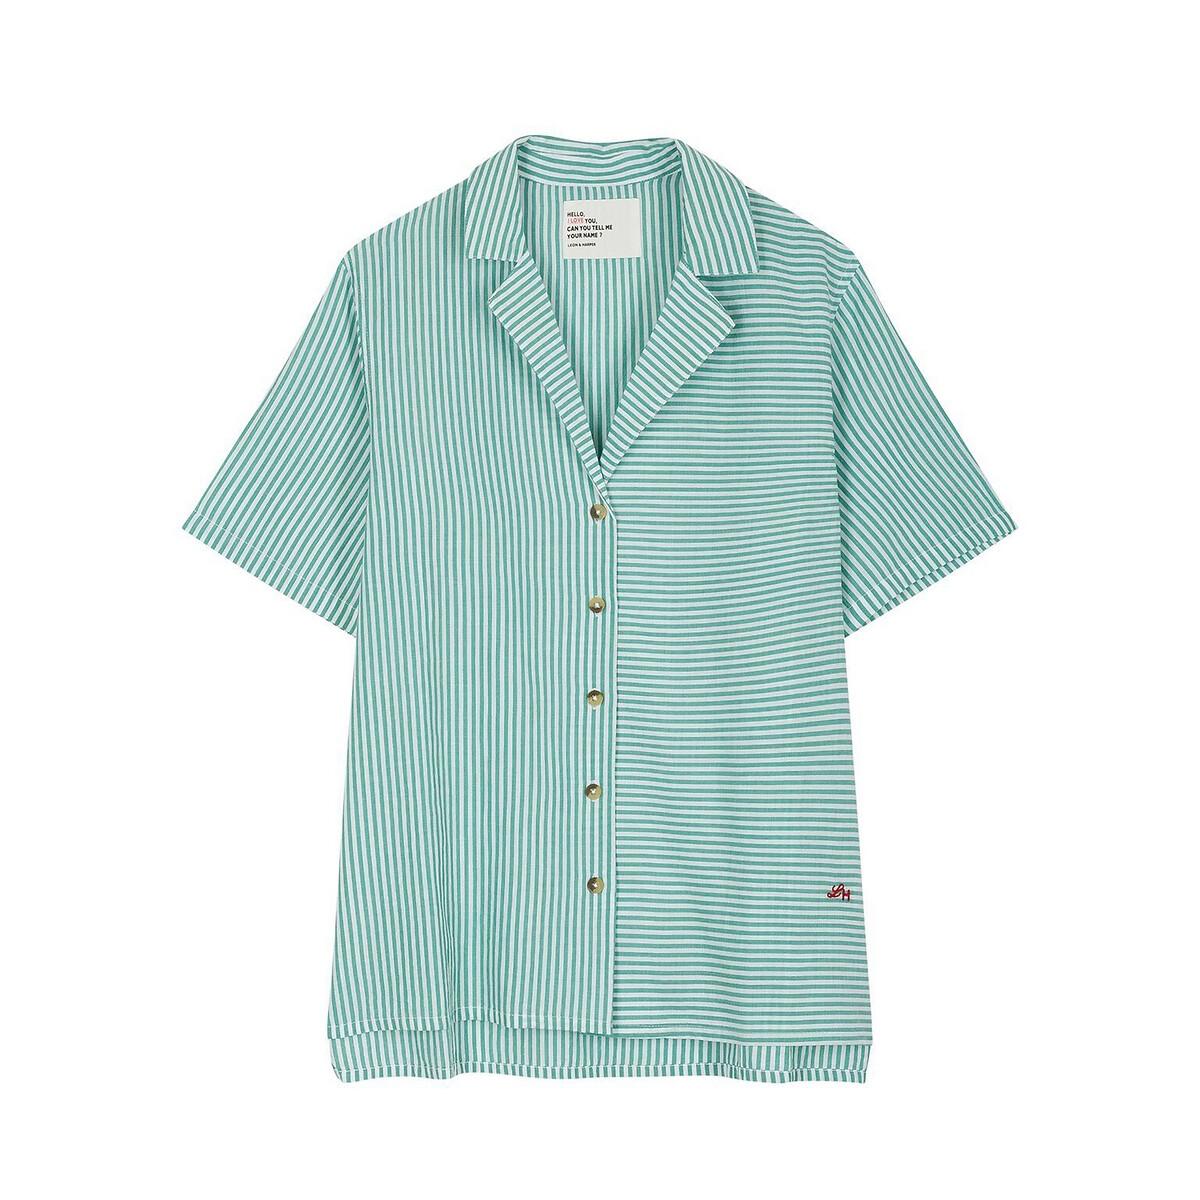 Рубашка La Redoute Из биохлопка с короткими рукавами CARAIBE S зеленый цена 2017